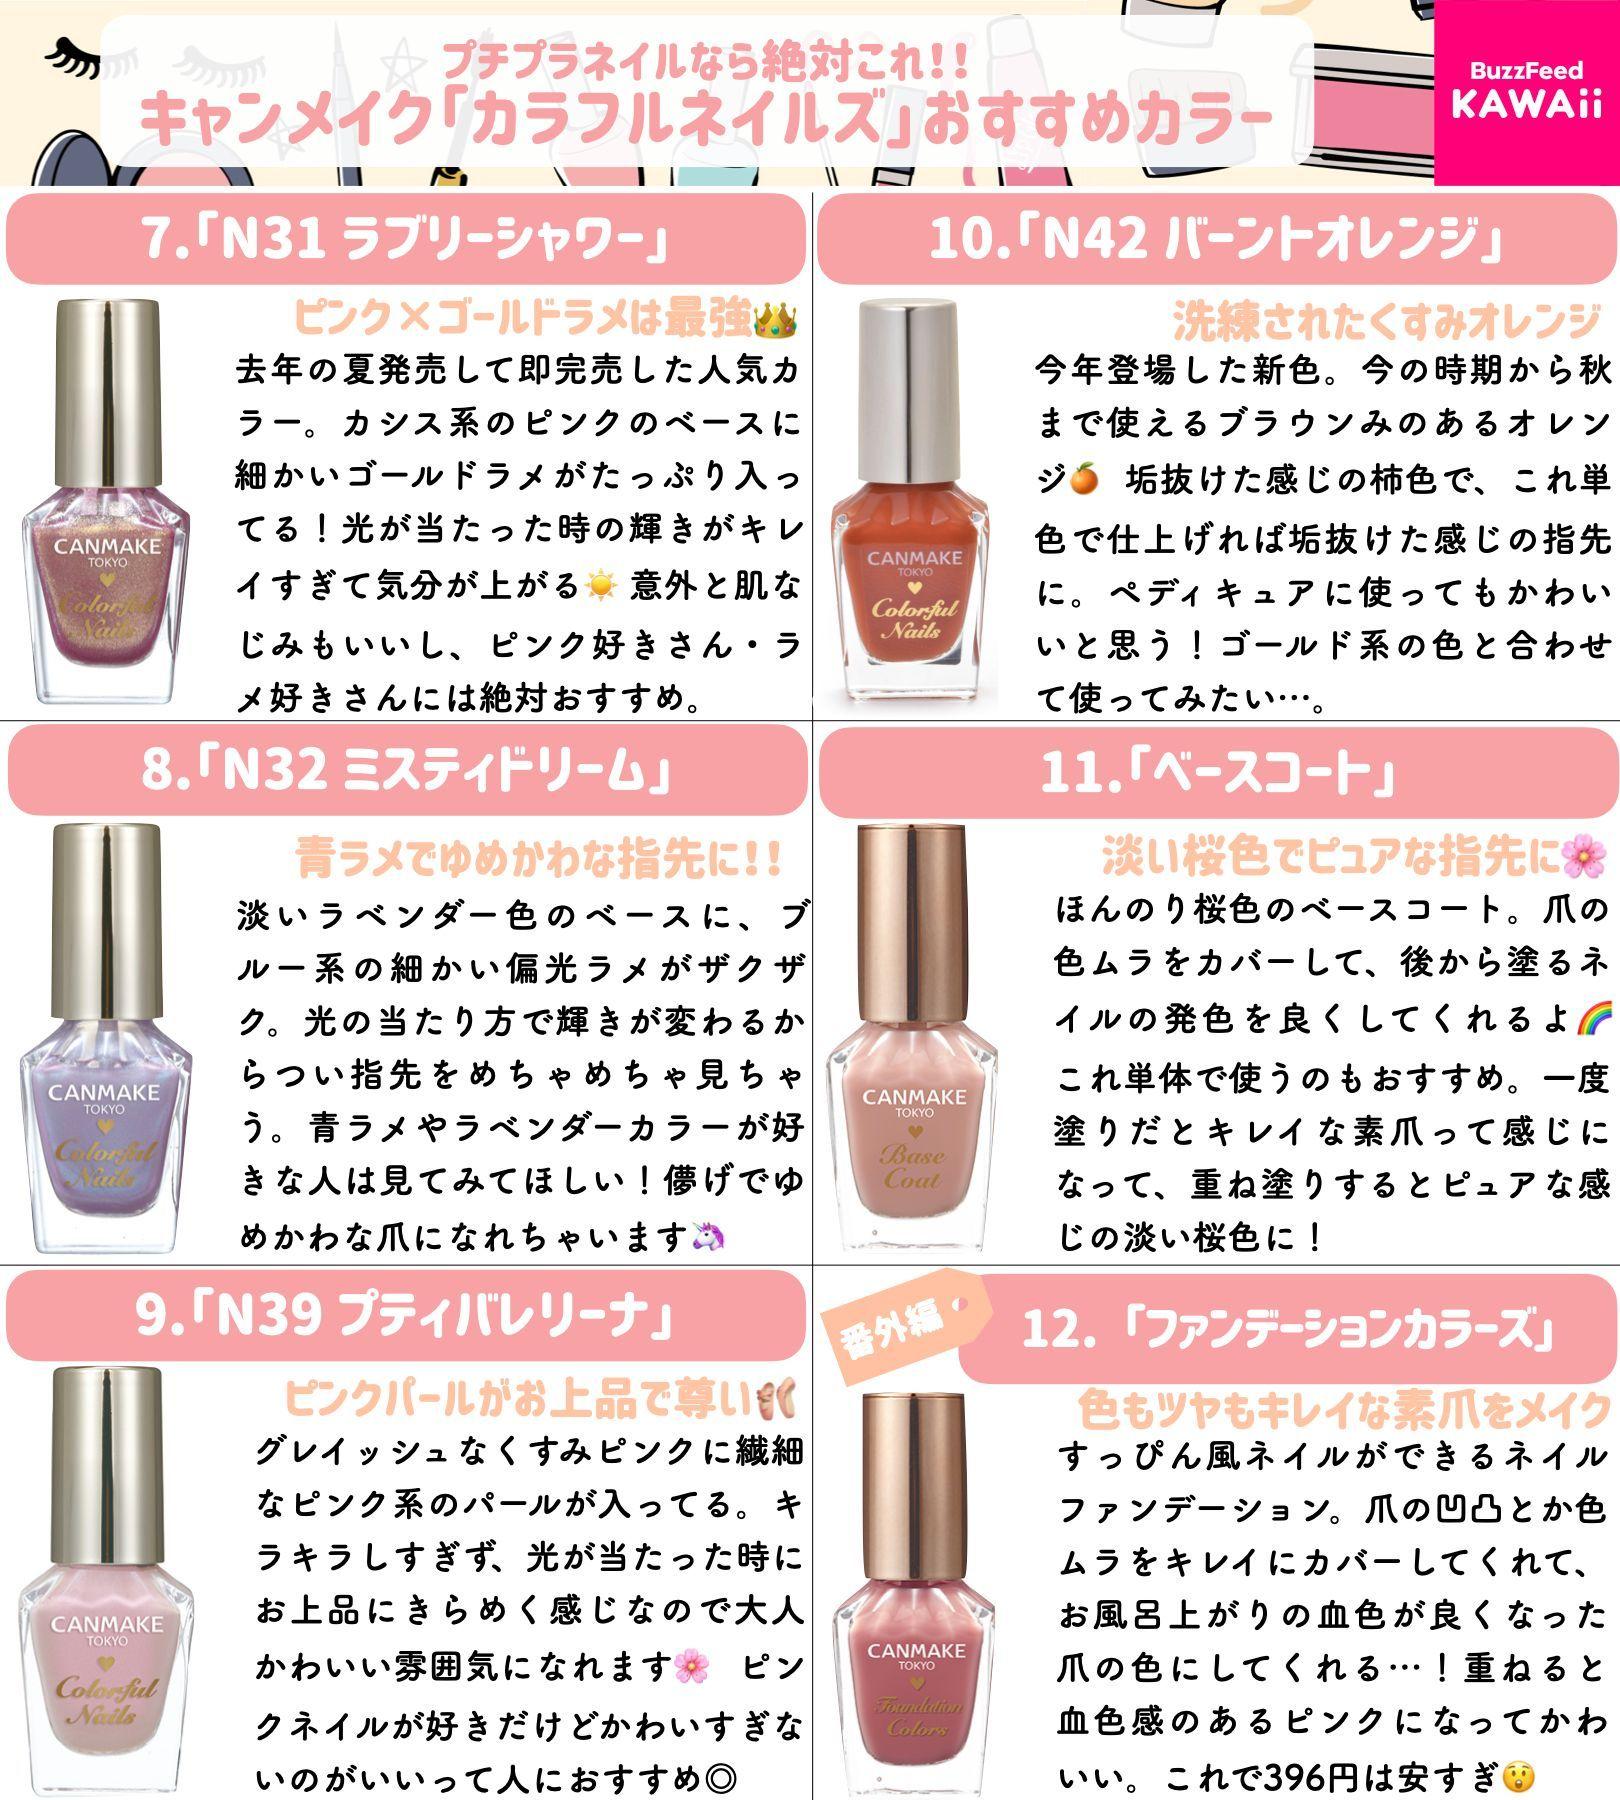 buzzfeed kawaii on twitter kawaii how to make naila